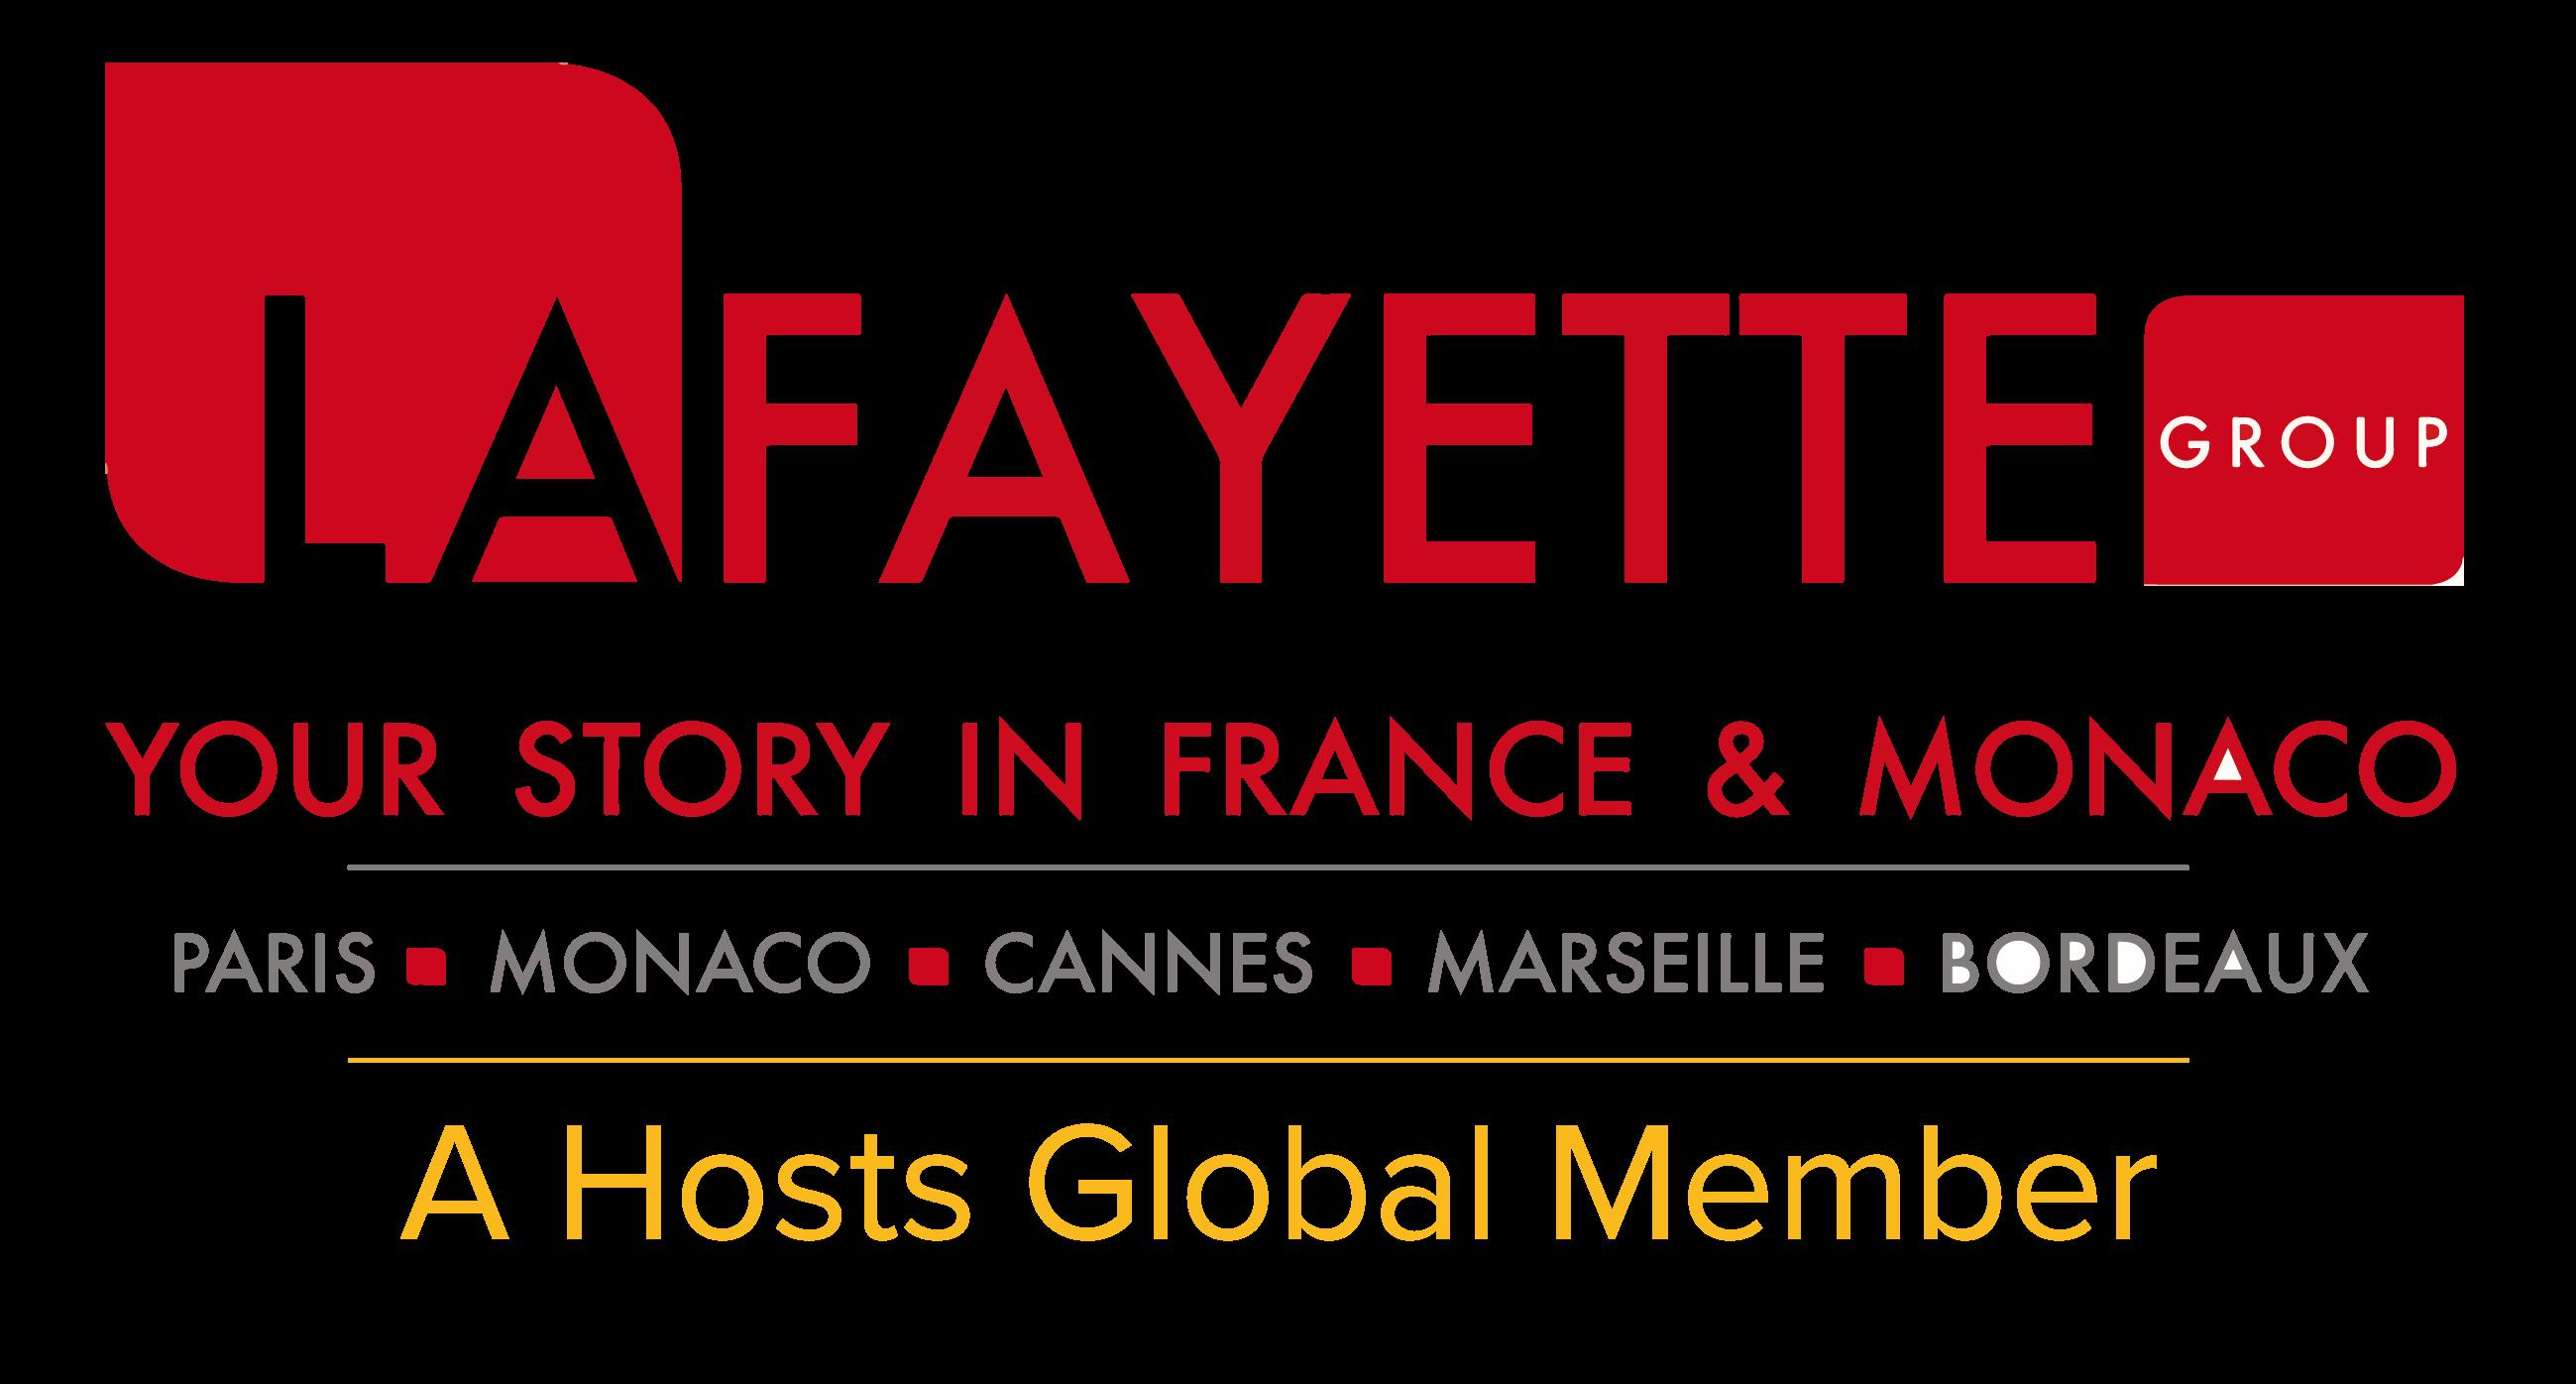 Lafayette Group - Monaco corporate event planning